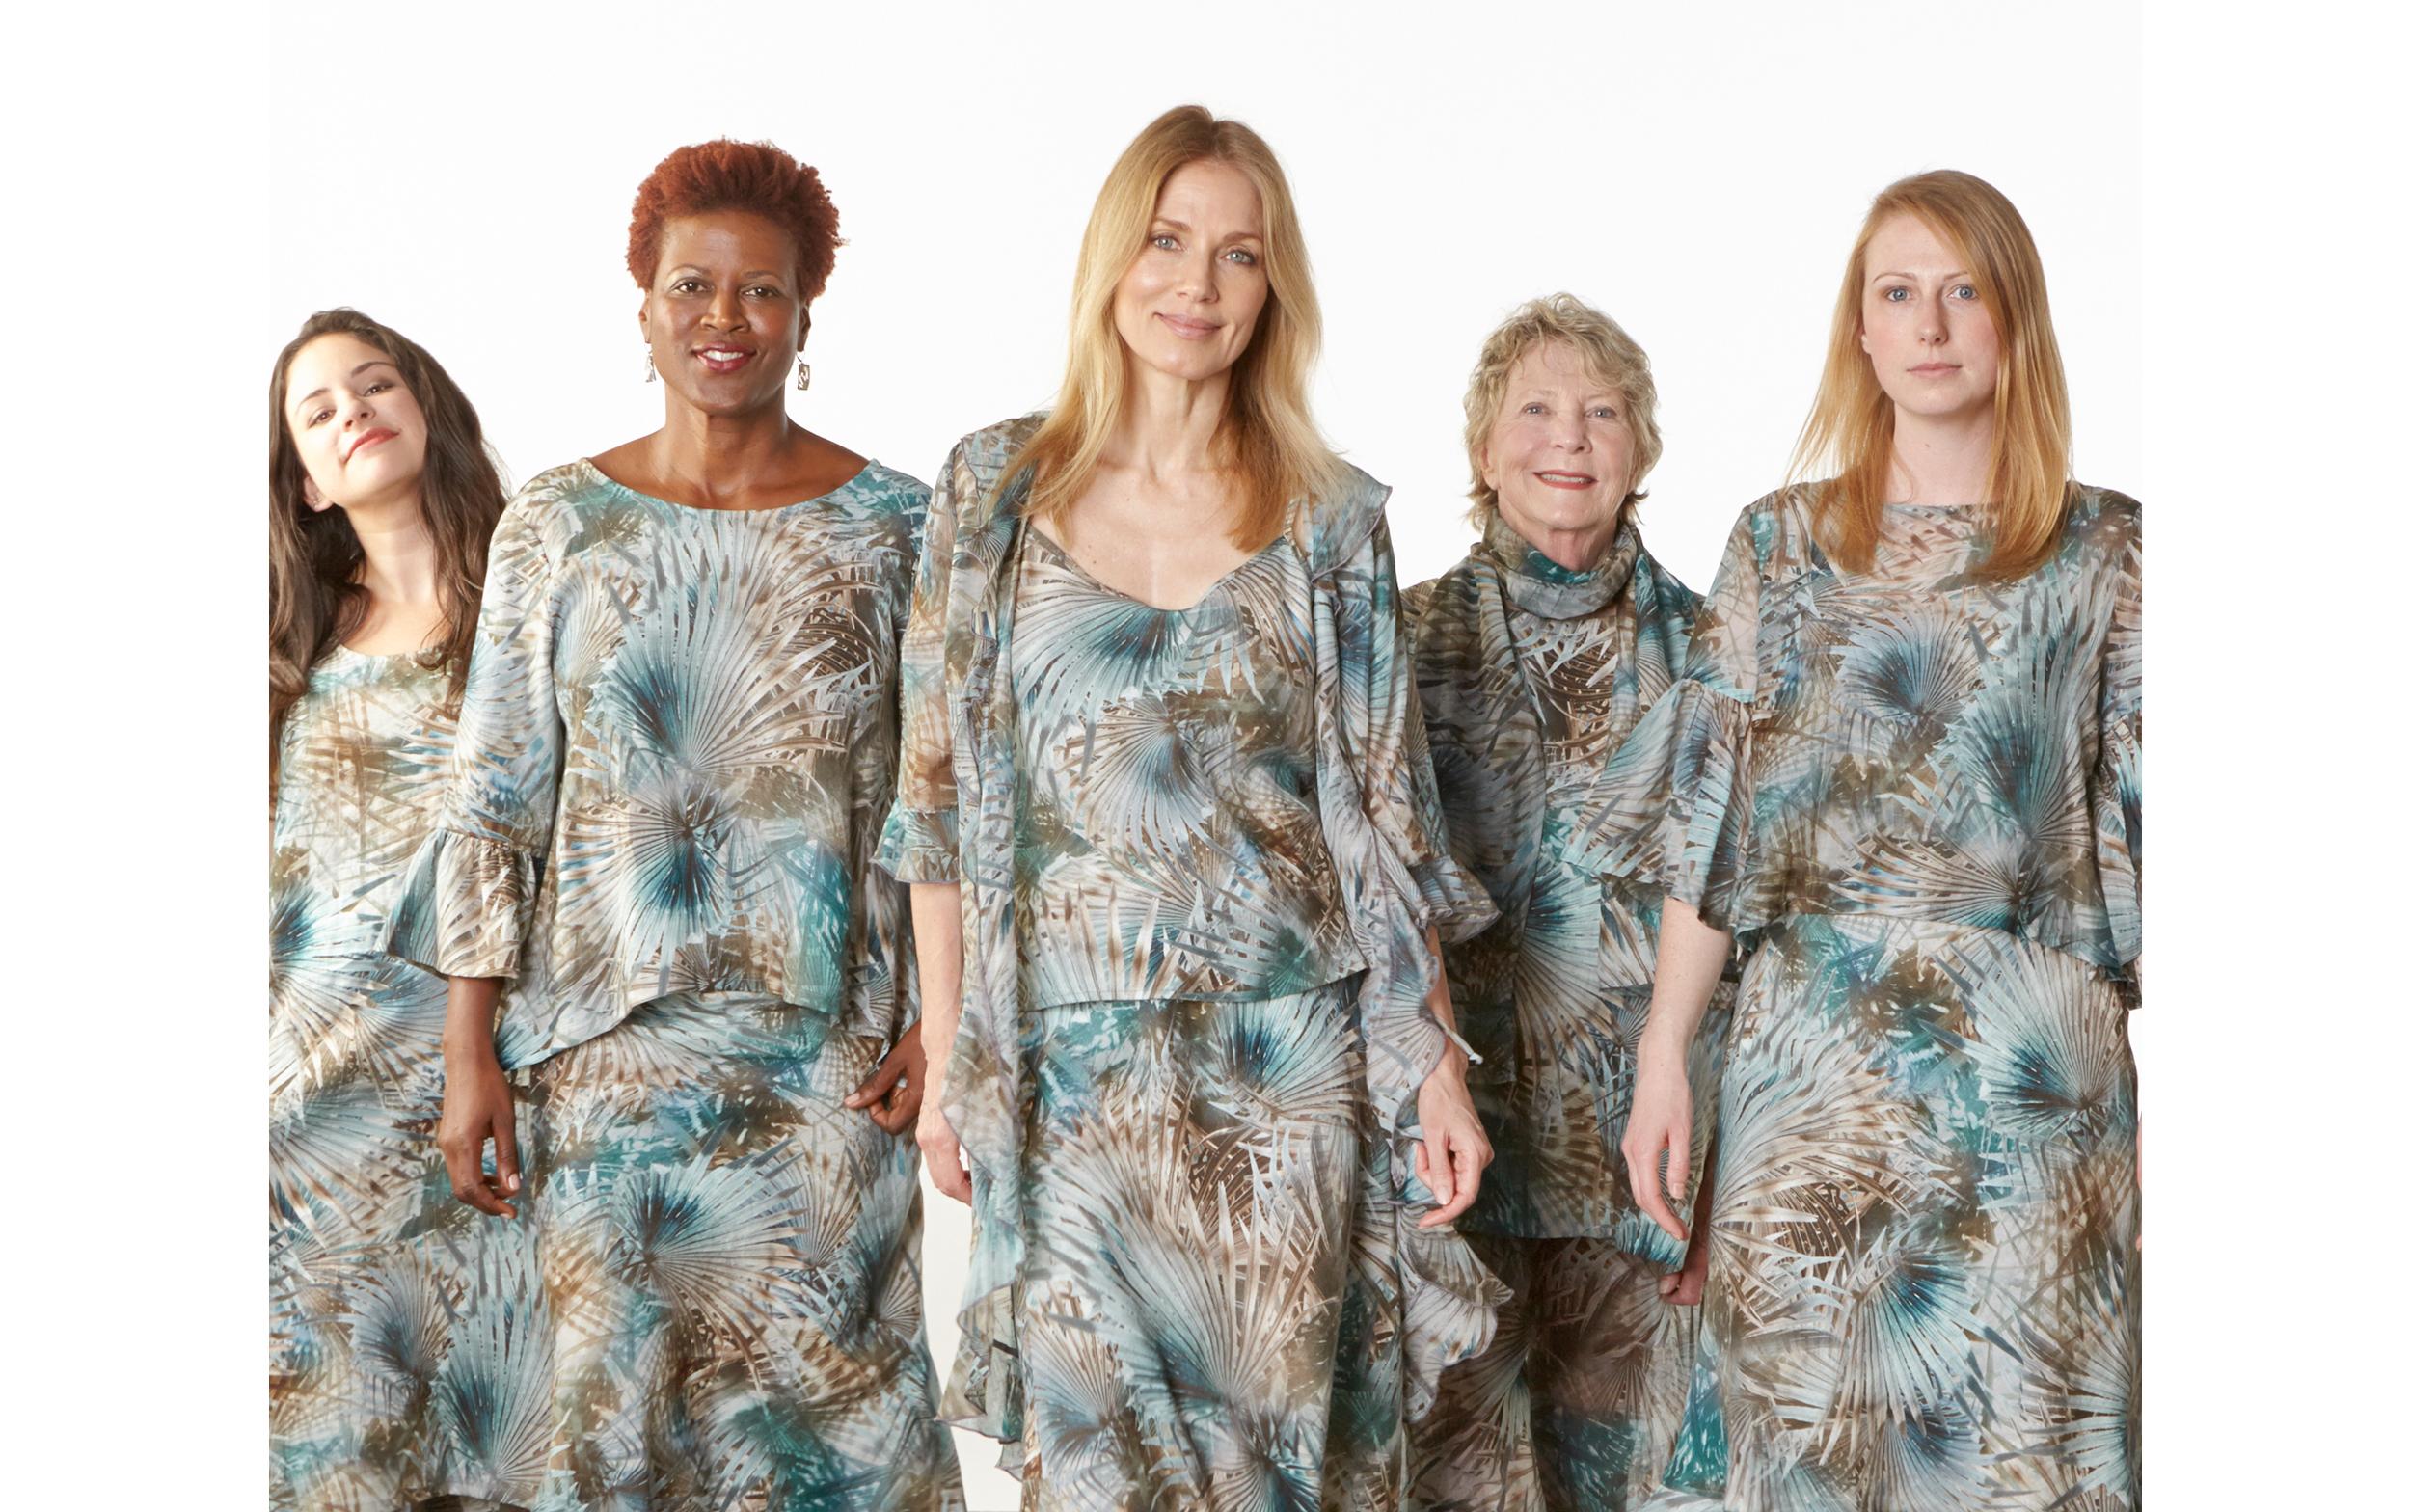 Luella Dress, Fran Shirt, Long Bias Skirt, Lucy Tank, Resort Shirt,Long Full Pant in Palma Italian Linen, Frida Shirt, Camille Cardigan, Scarf in Palma Italian Cotton/Silk